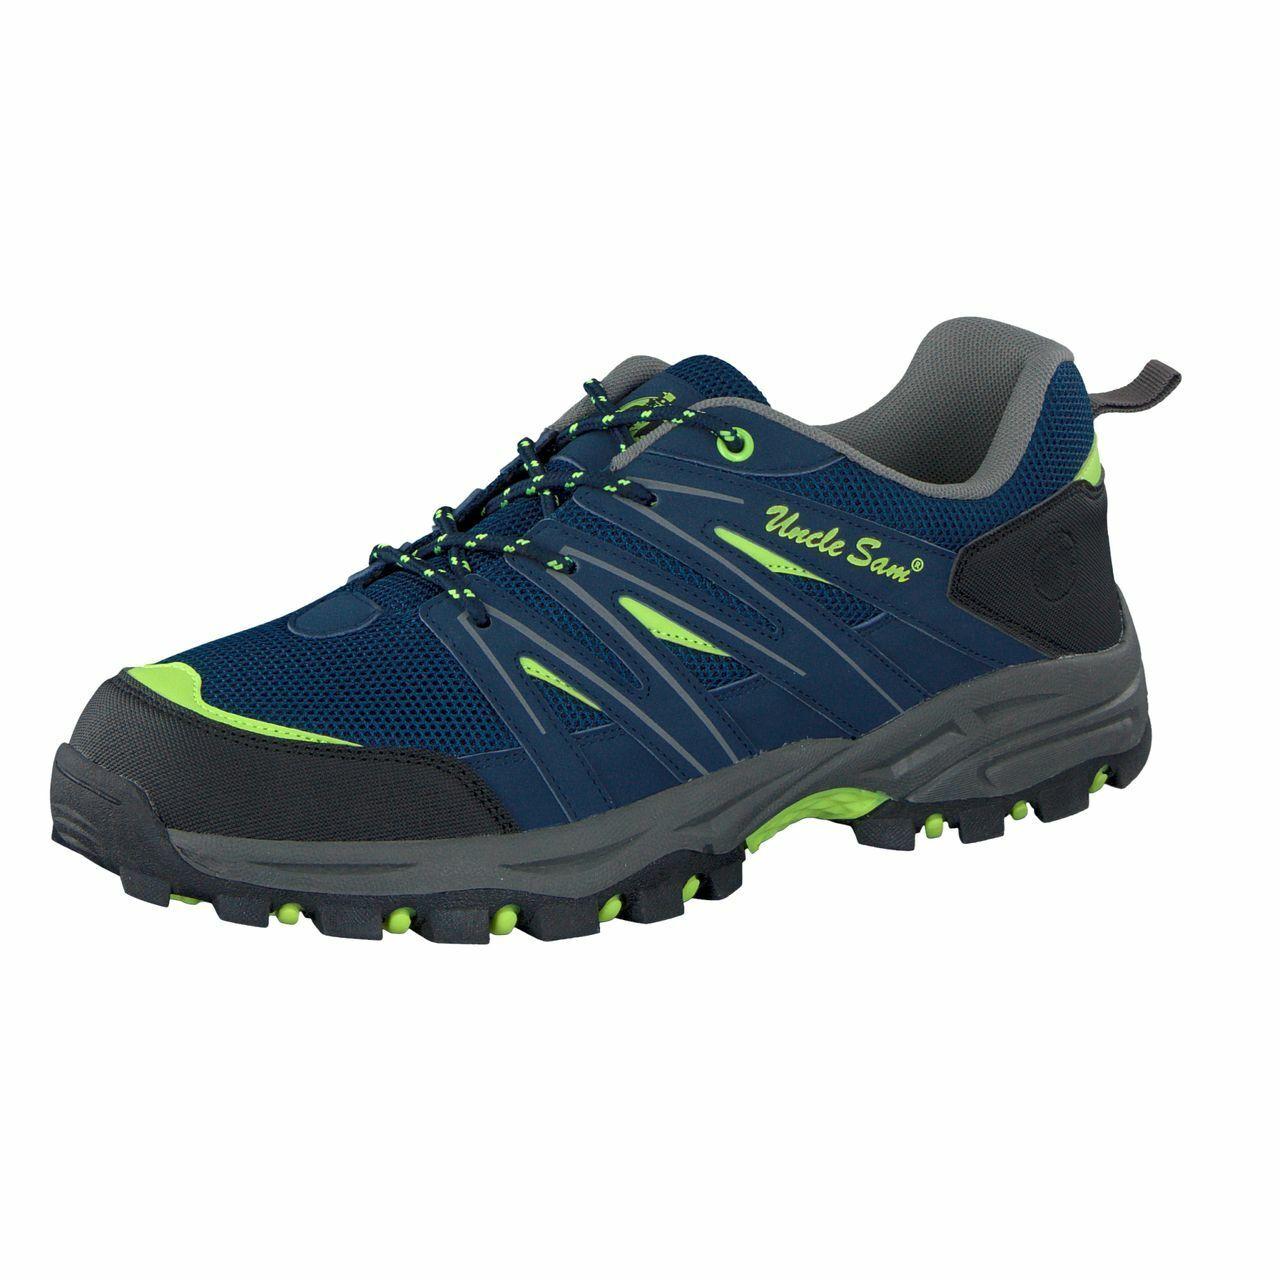 Uncle Sam shoes da Trekking men shoes Outdoor blue Marino Calce